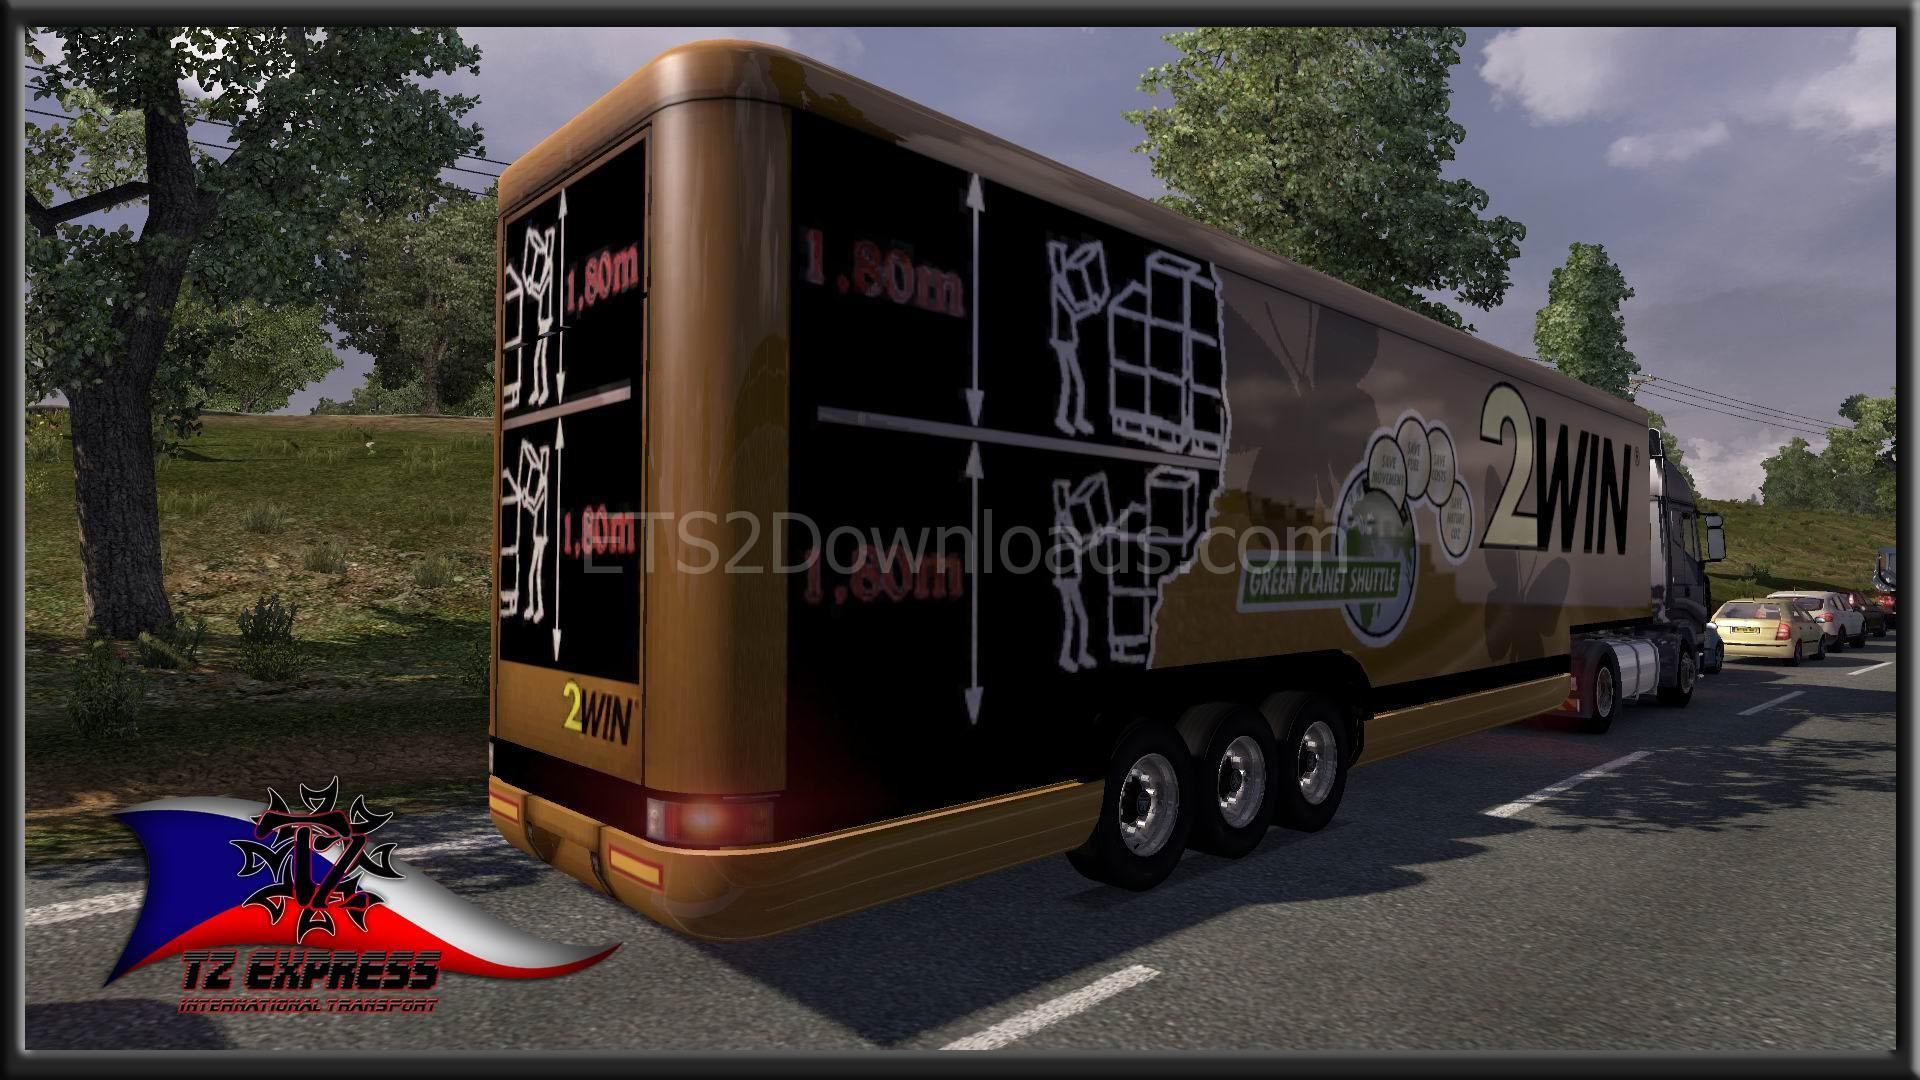 aero-dynamic-2win-trailer-ets2-1